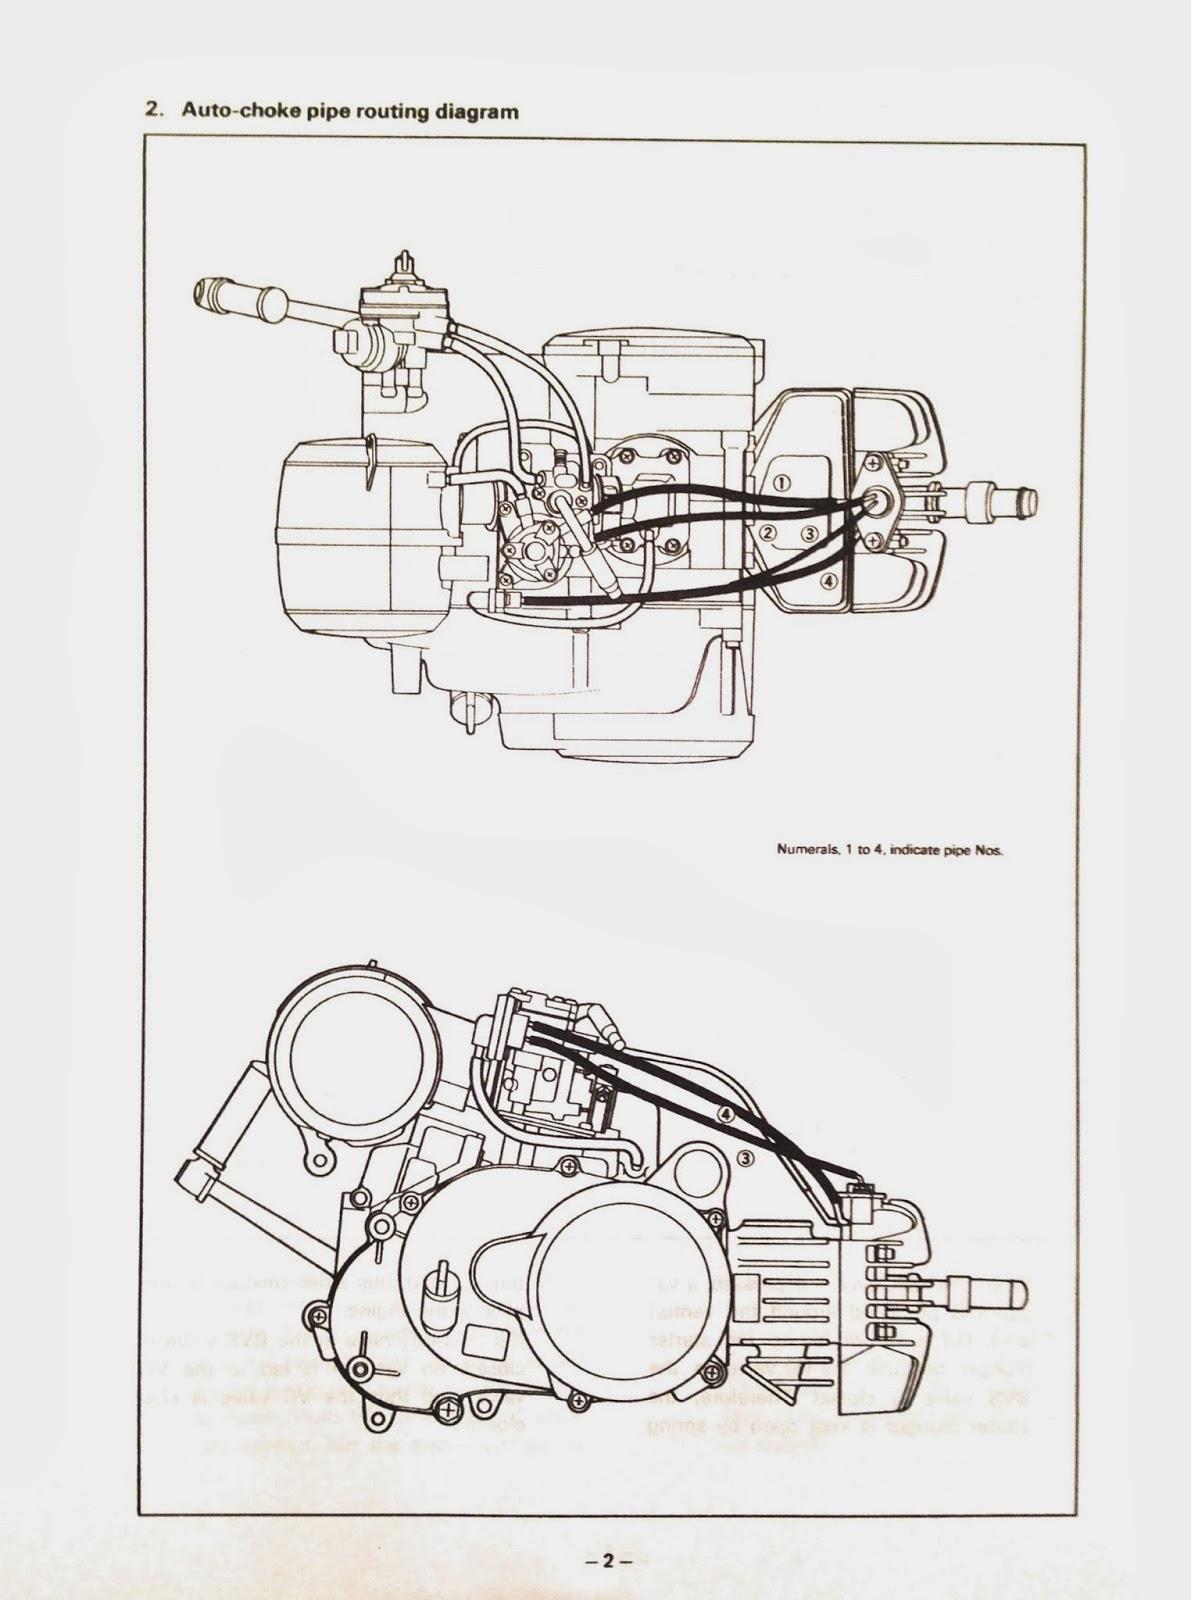 yamaha lc50 yamaha lc50 service manual yamaha motorcycle schematics lc 50 service manual in jpg format